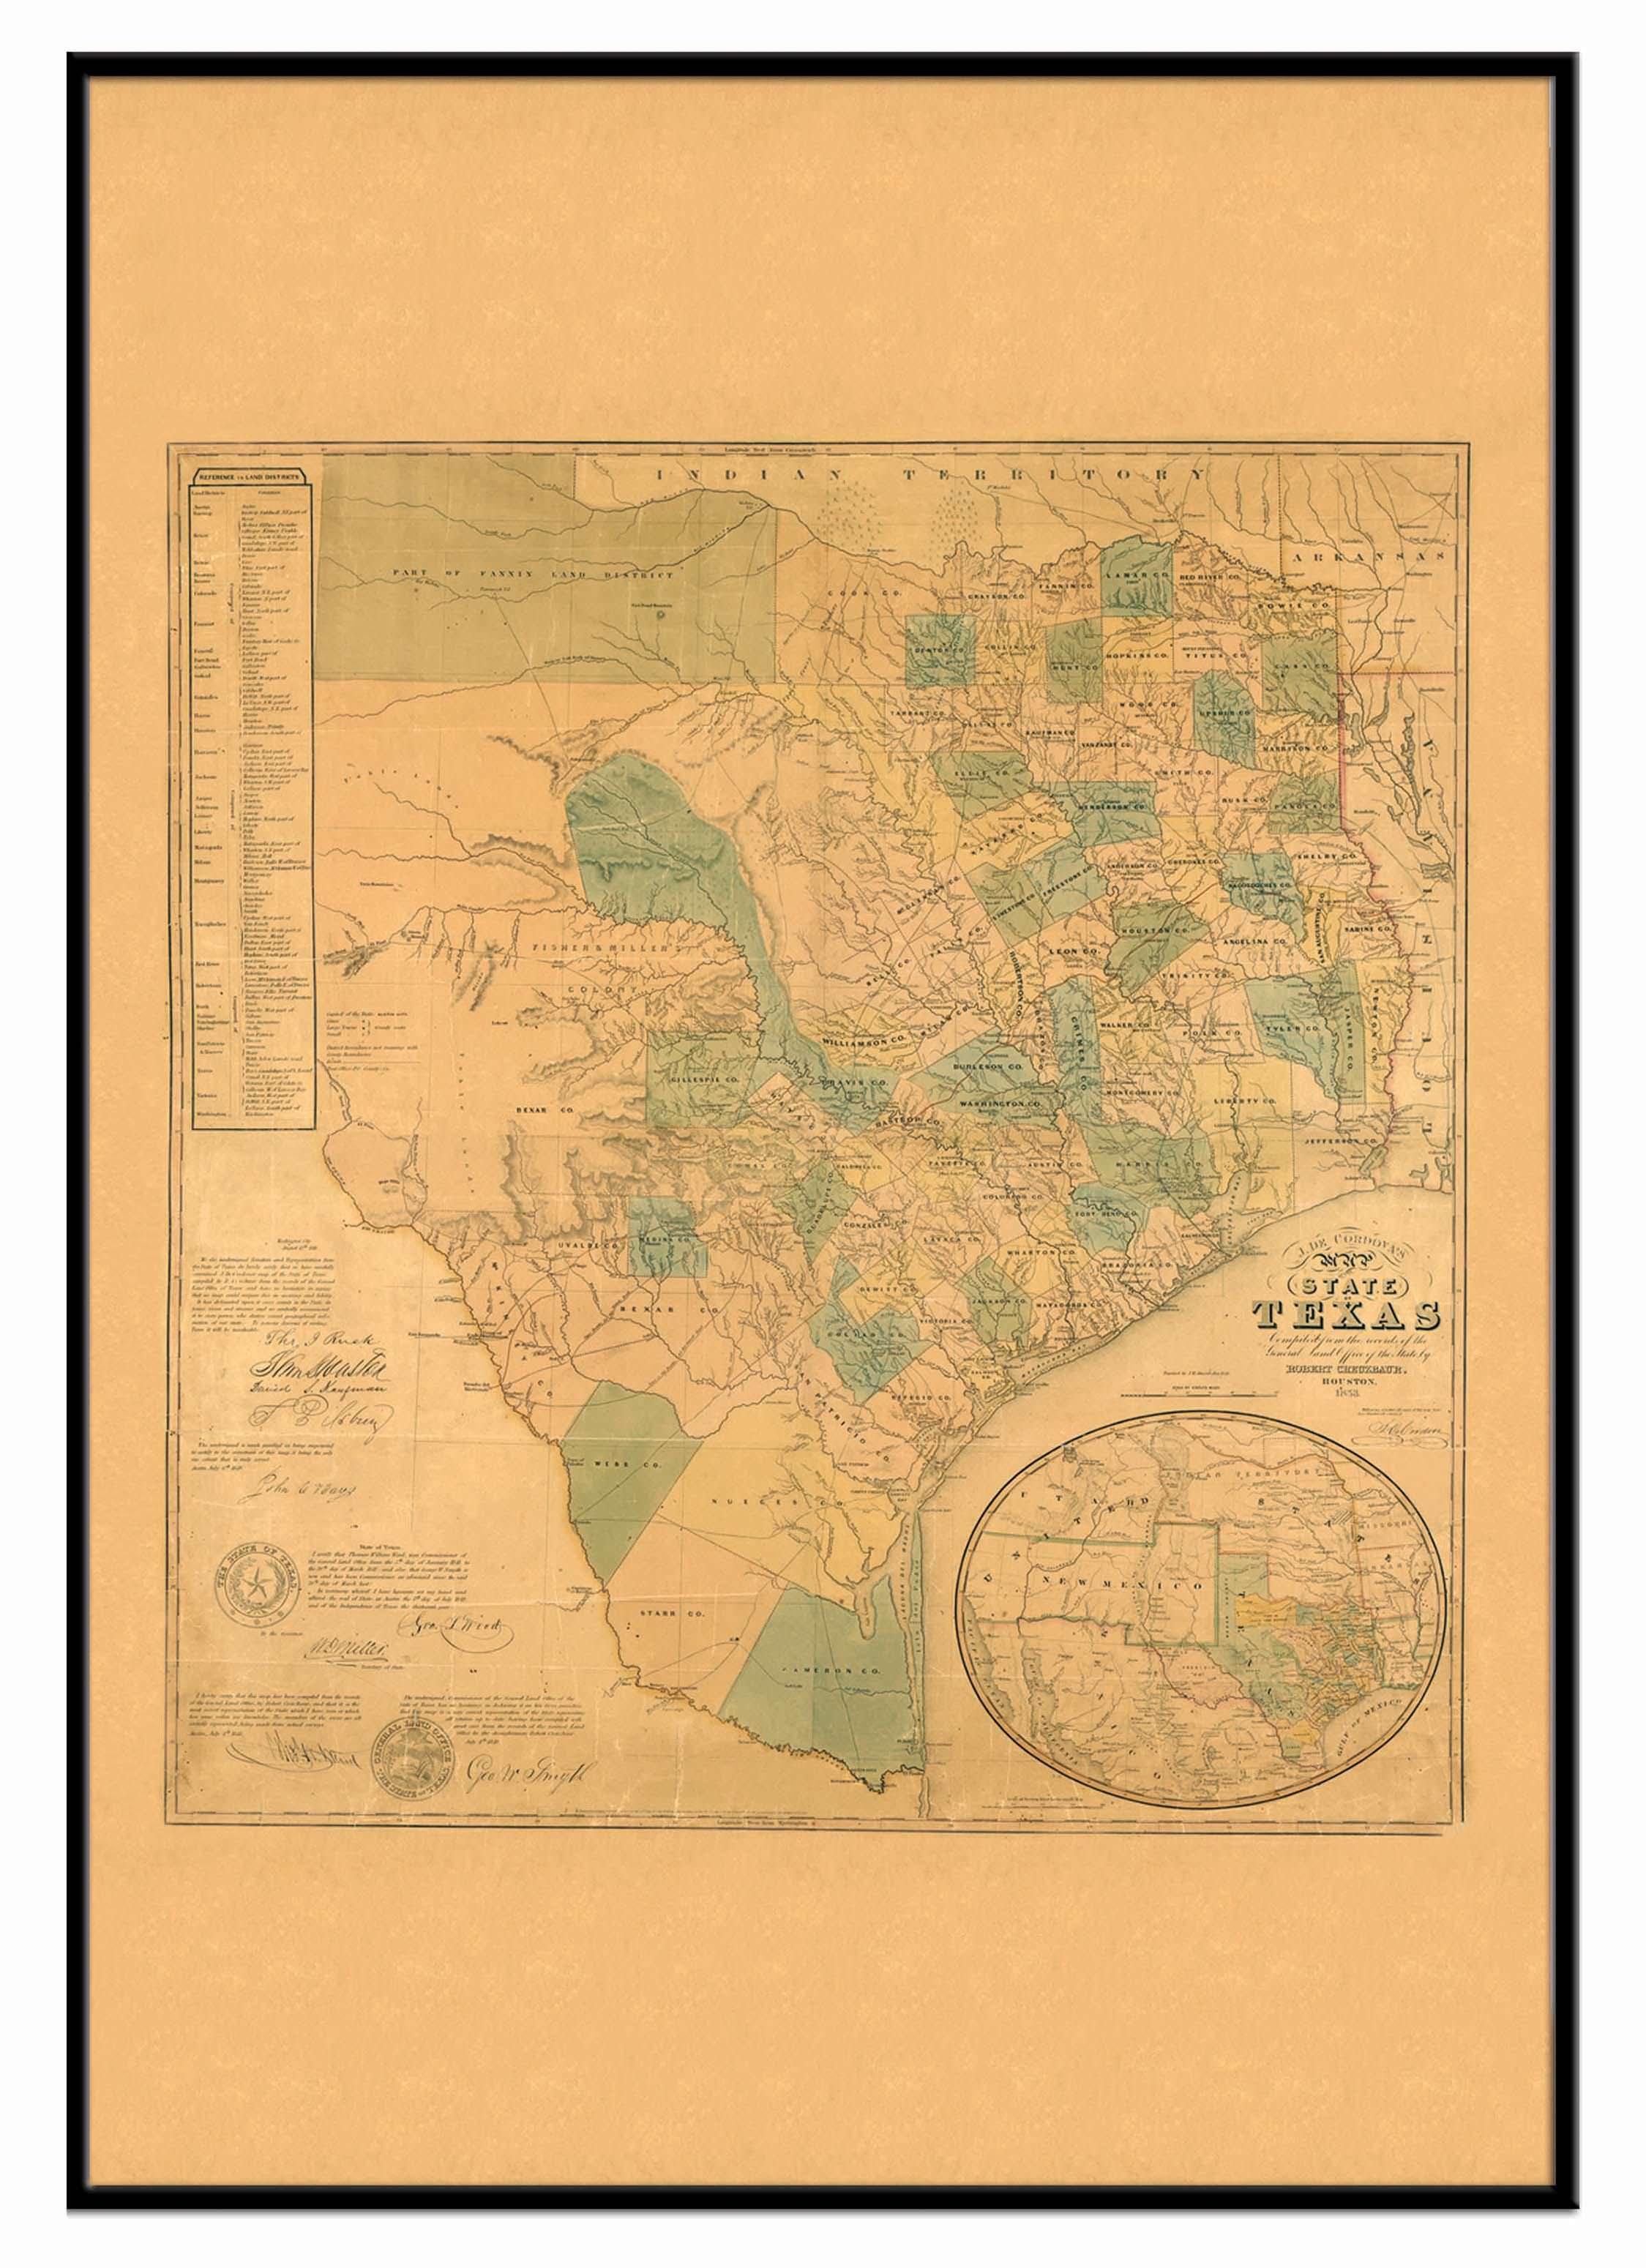 Texas 1853 Historical Print Framed Wall Map (Black) – Kappa Map Group - Framed Texas Map